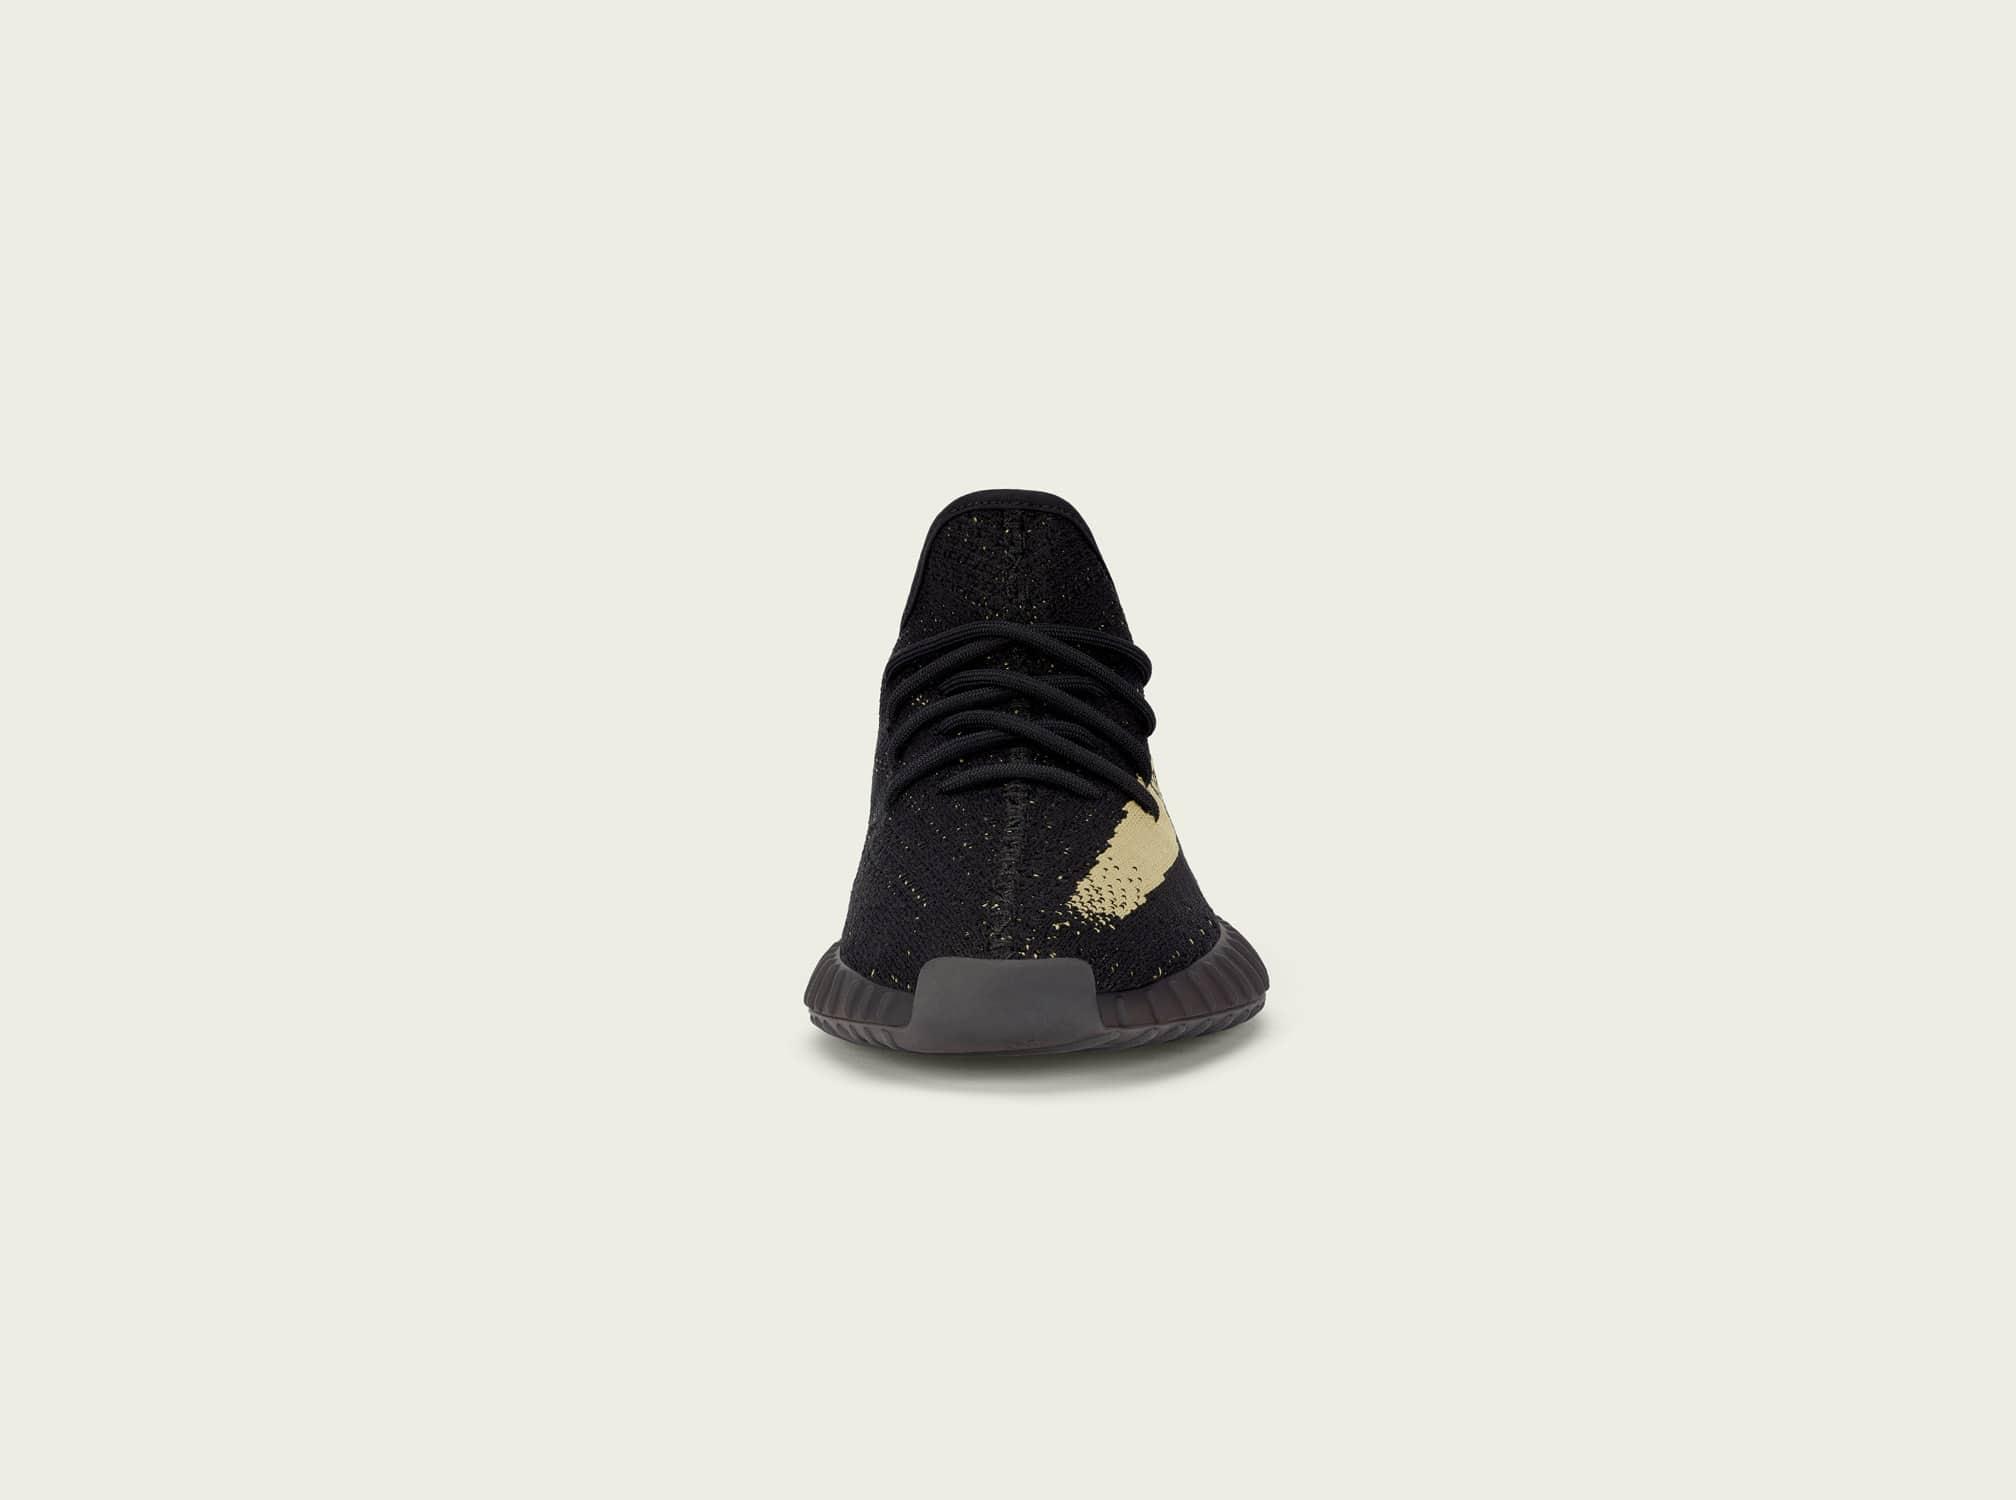 adidas KANYE WEST YEEZY BOOST 350 V2 5